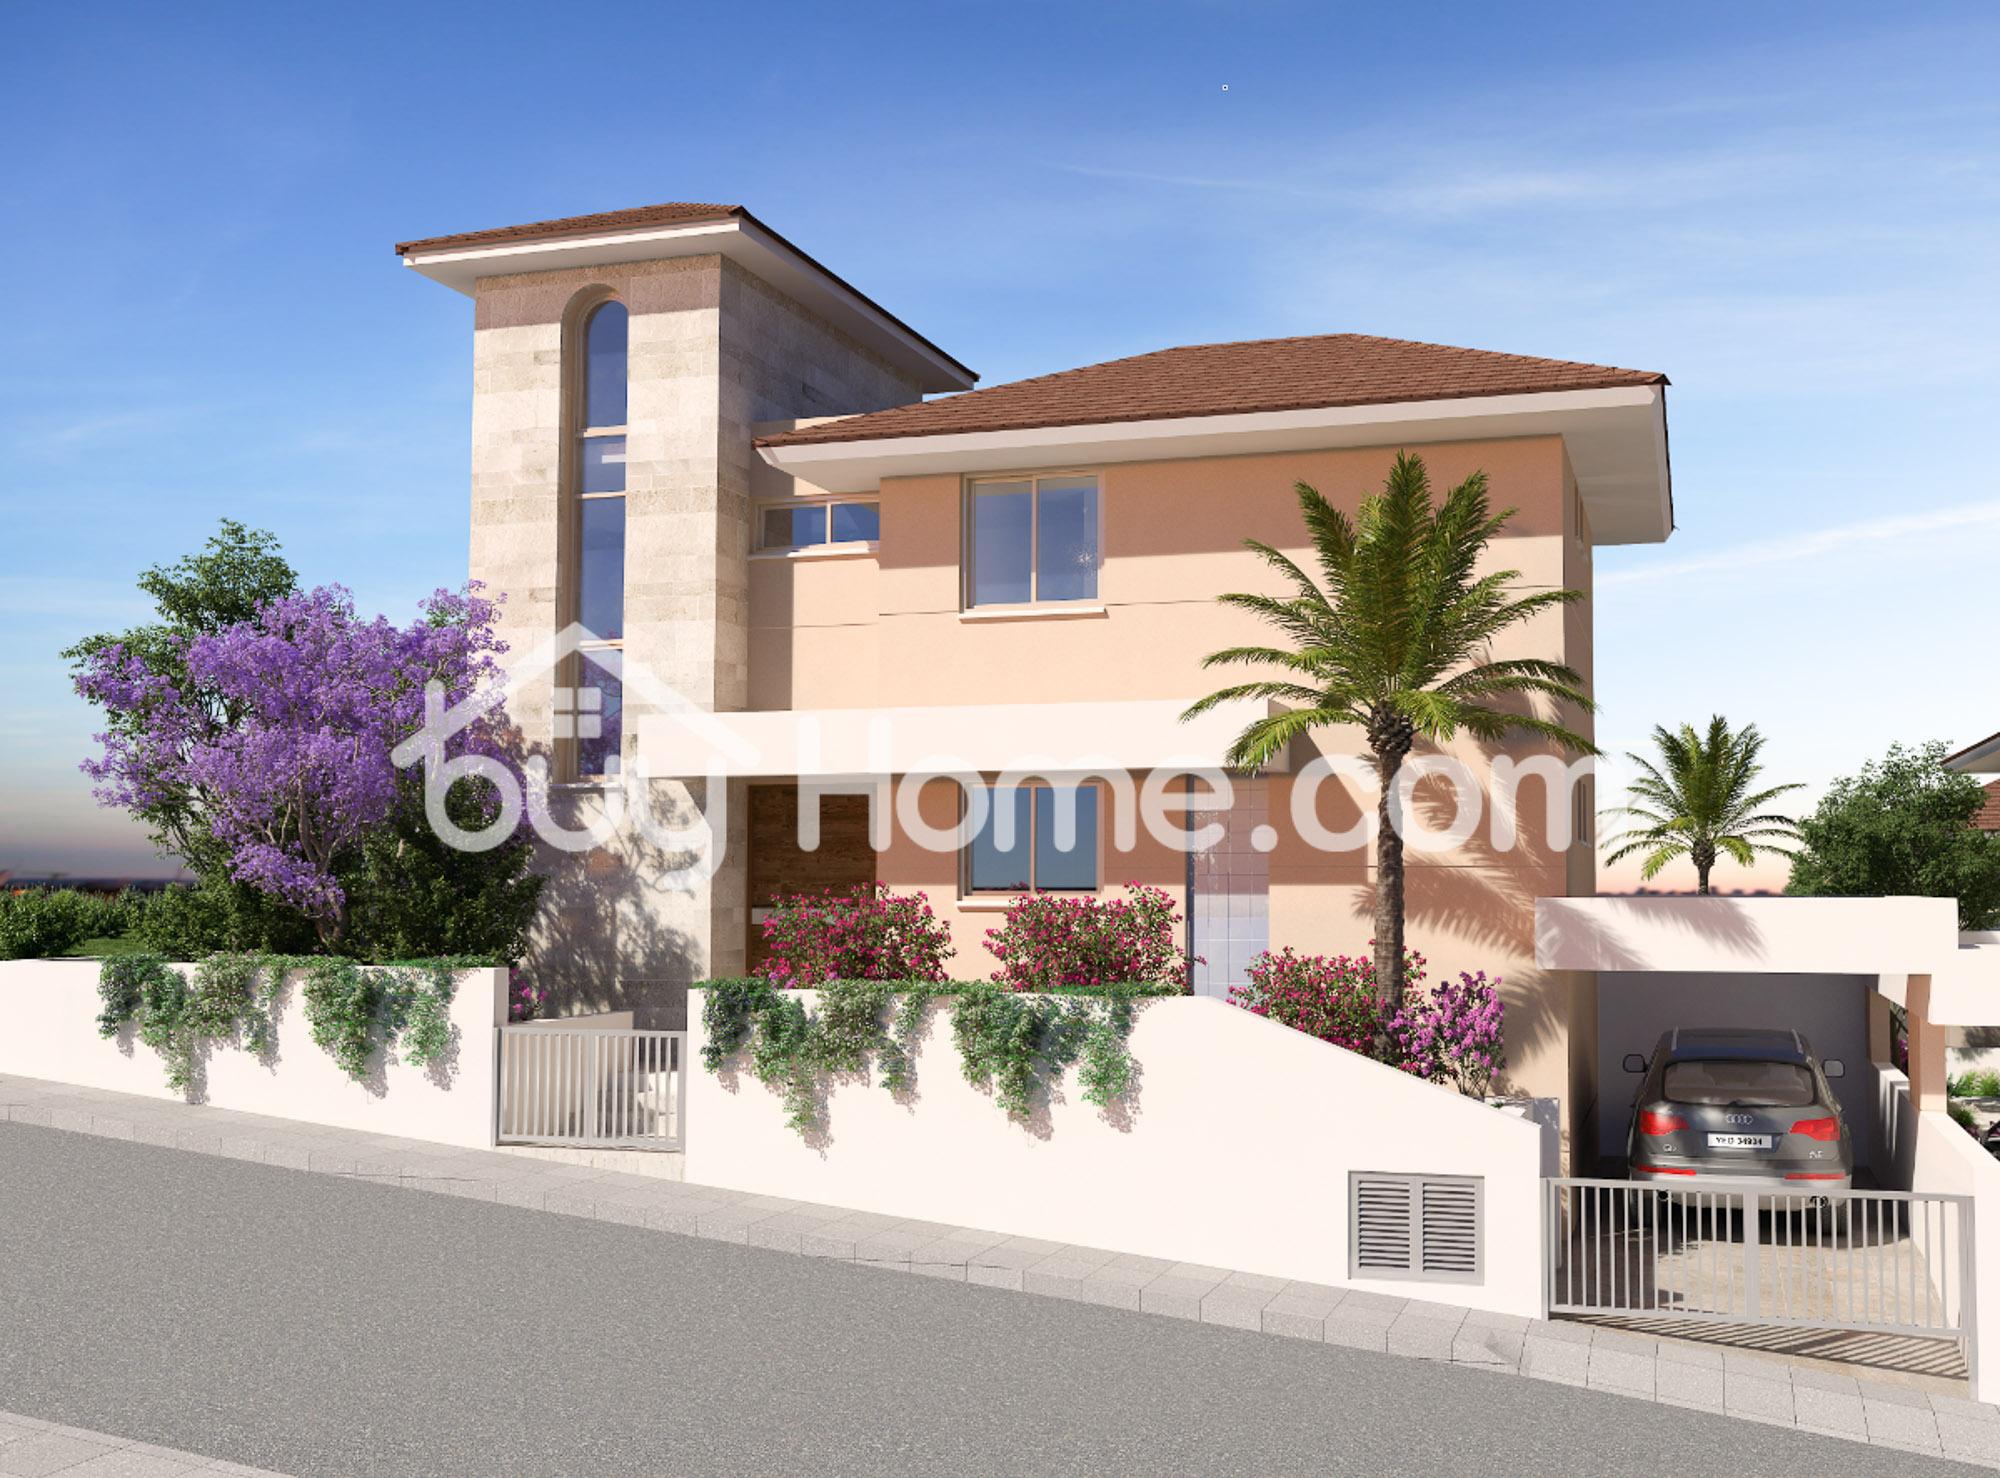 Villa Opposite The Sea Buy Home